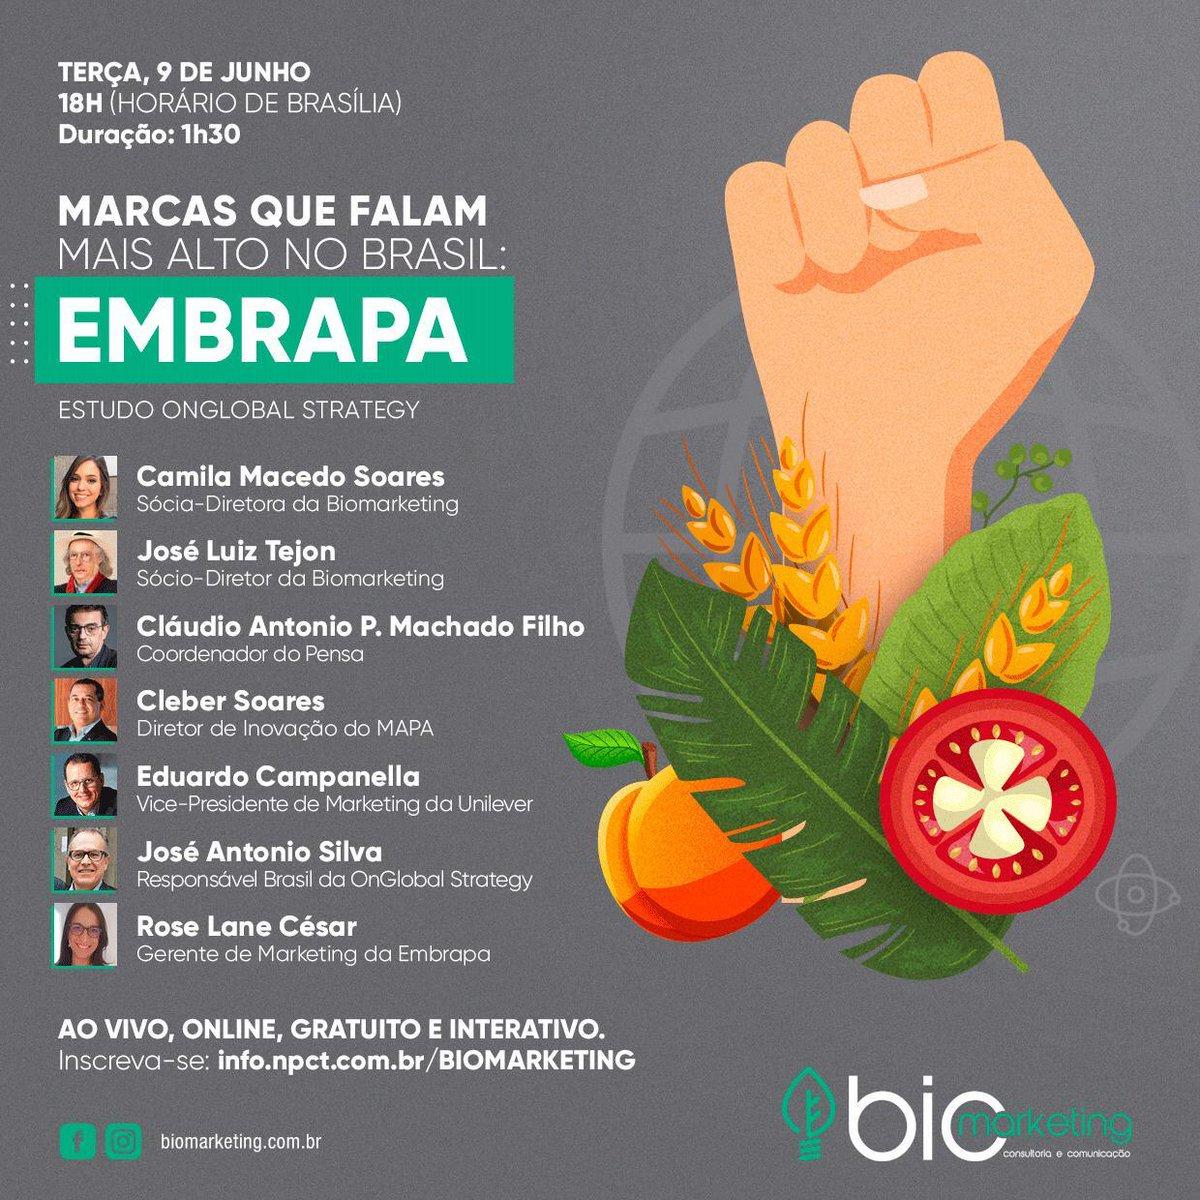 "Segundo estudo realizado pela OnGlobal Strategy, ""Embrapa"" é a marca mais consolidada no Agro brasileiro.   #embrapa #marca #marketing #imagem #agro #agricultura #agronegocio #credibilidade"